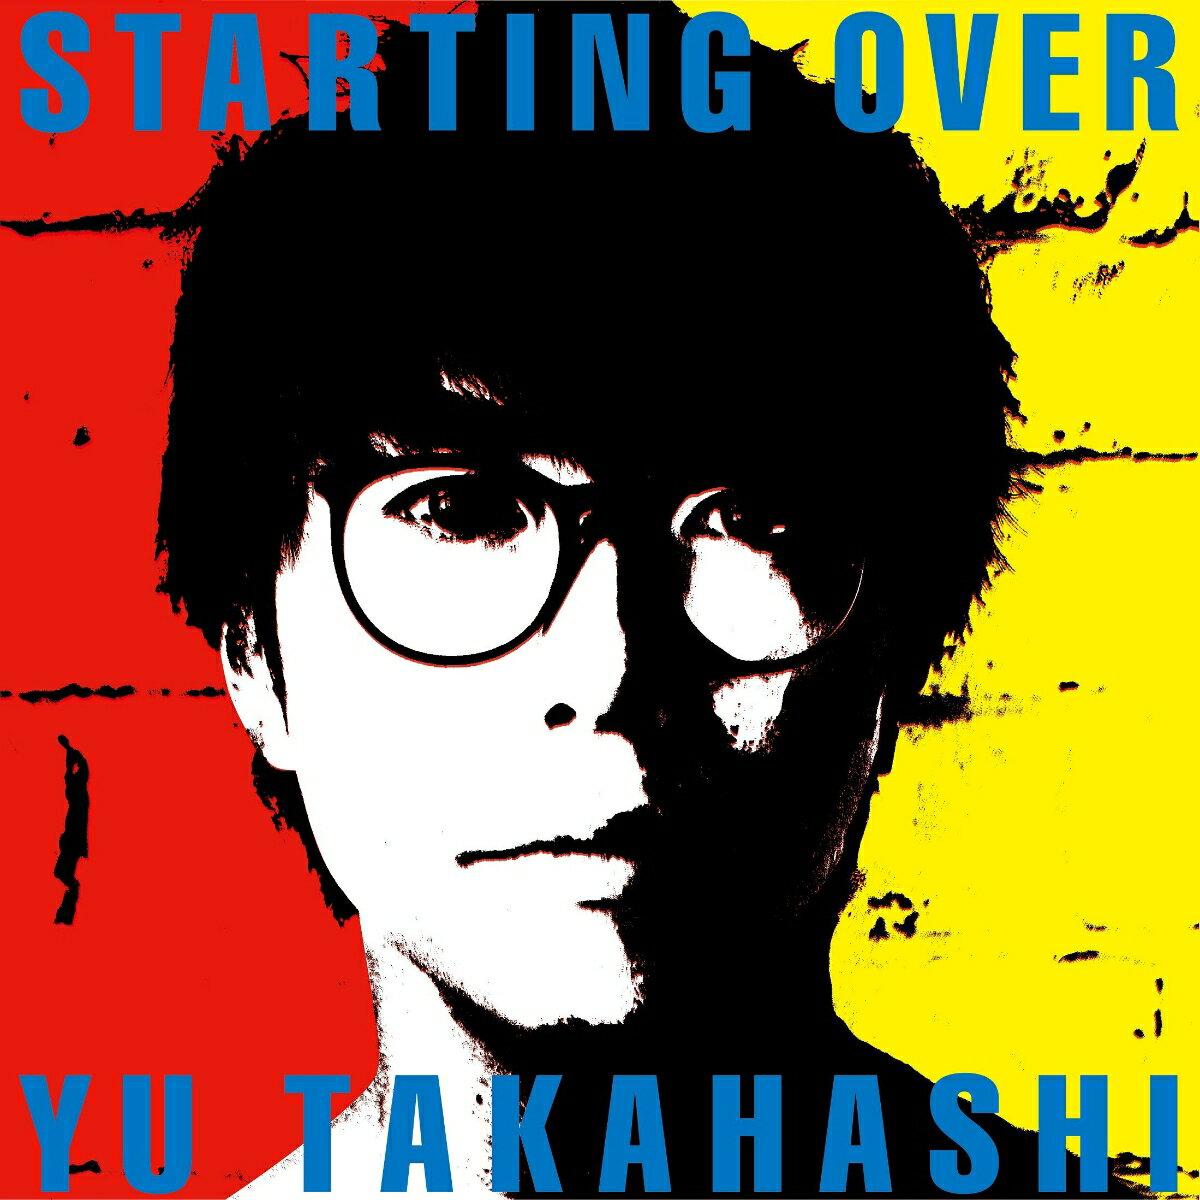 STARTING OVER (数量生産限定盤 CD+LPサイズBOX+フォトブック) [ 高橋優 ]